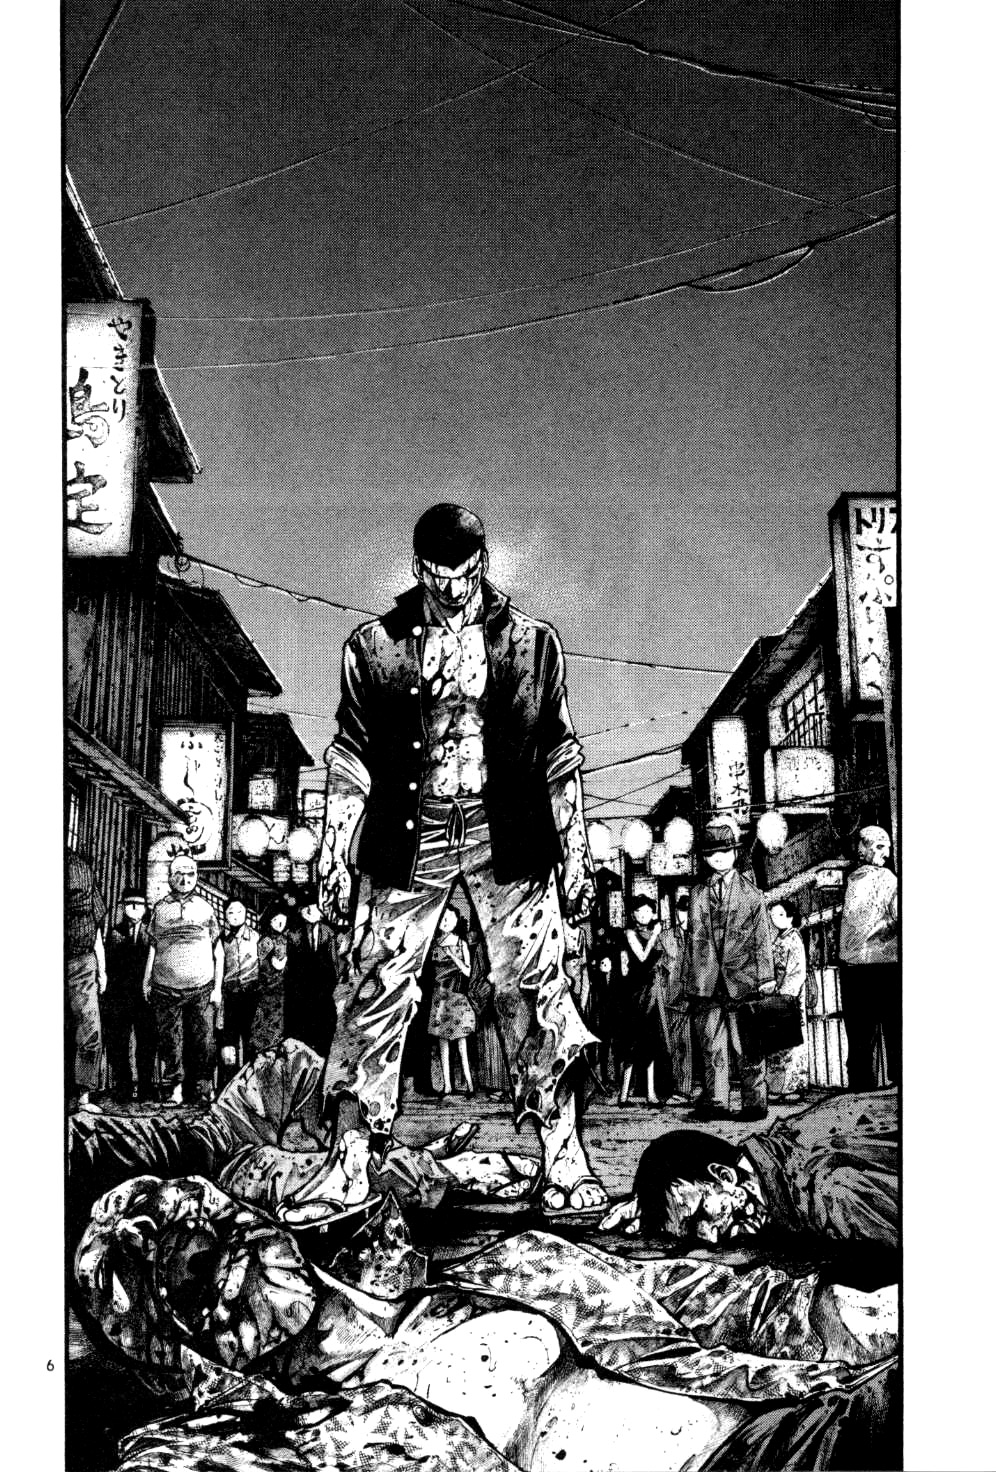 https://r2.ninemanga.com/comics/pic3/55/35447/1277589/1542453746458.jpg Page 16